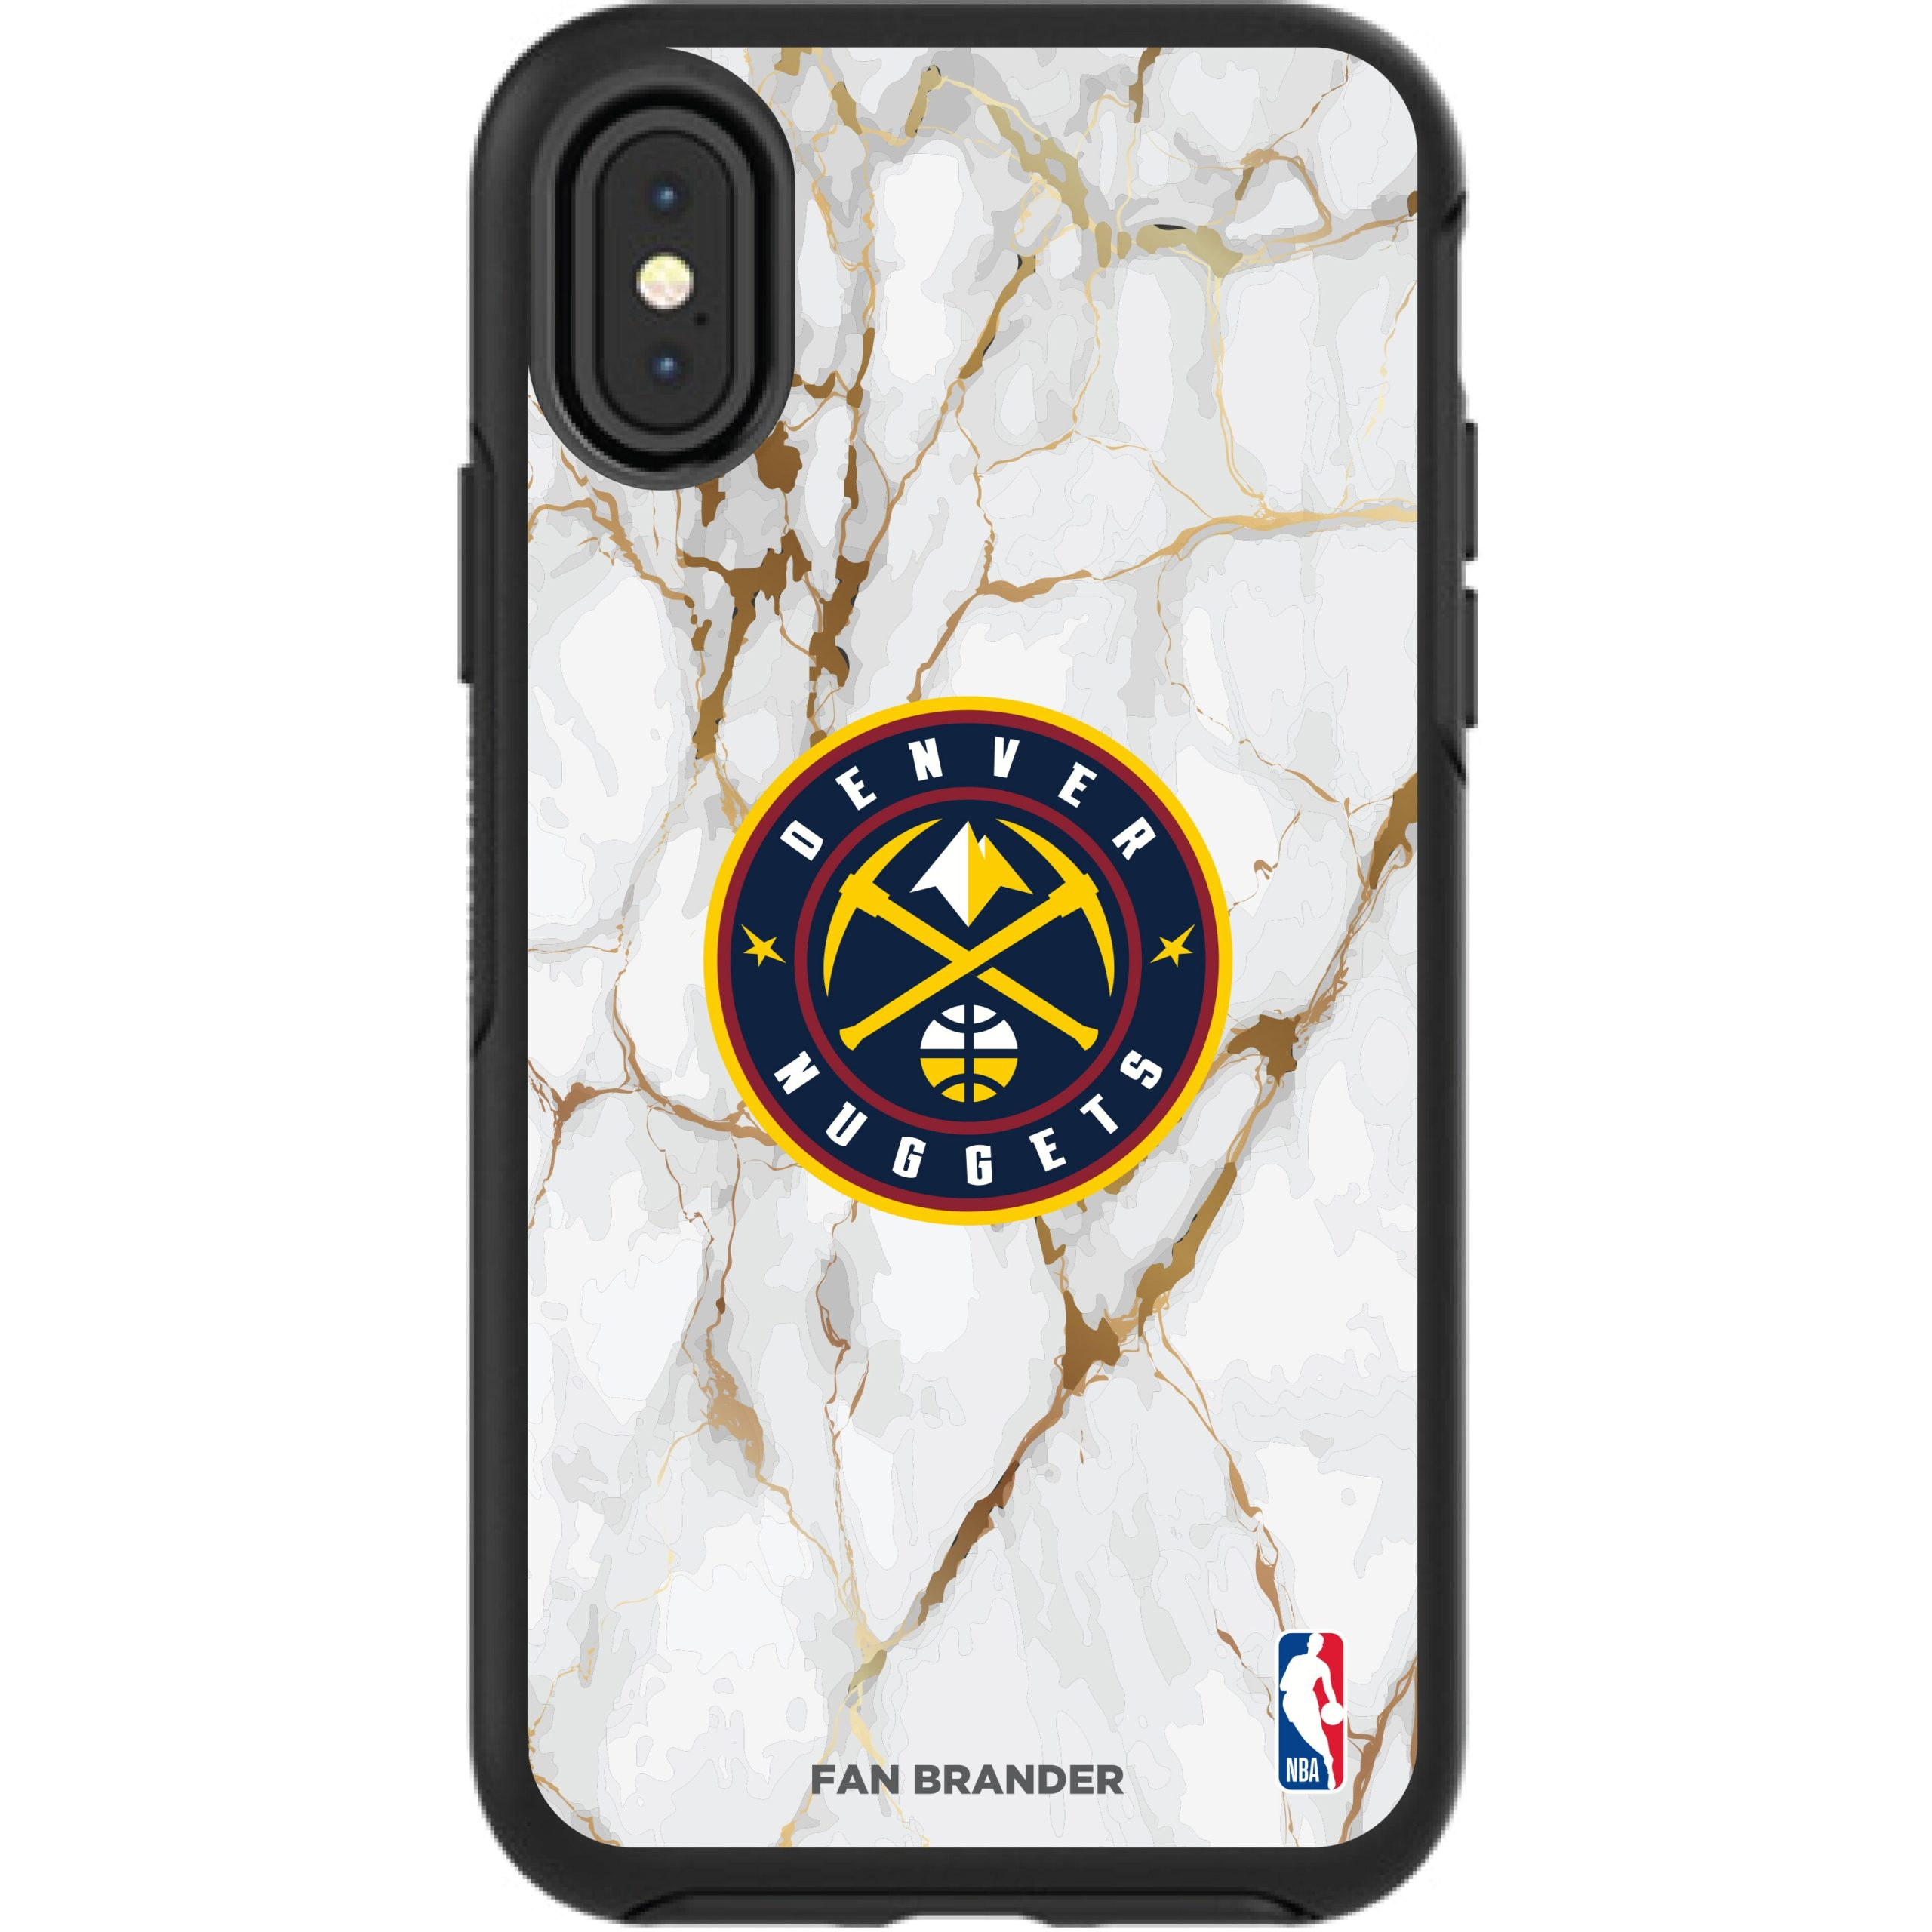 Denver Nuggets iPhone Symmetry Marble Case - Black